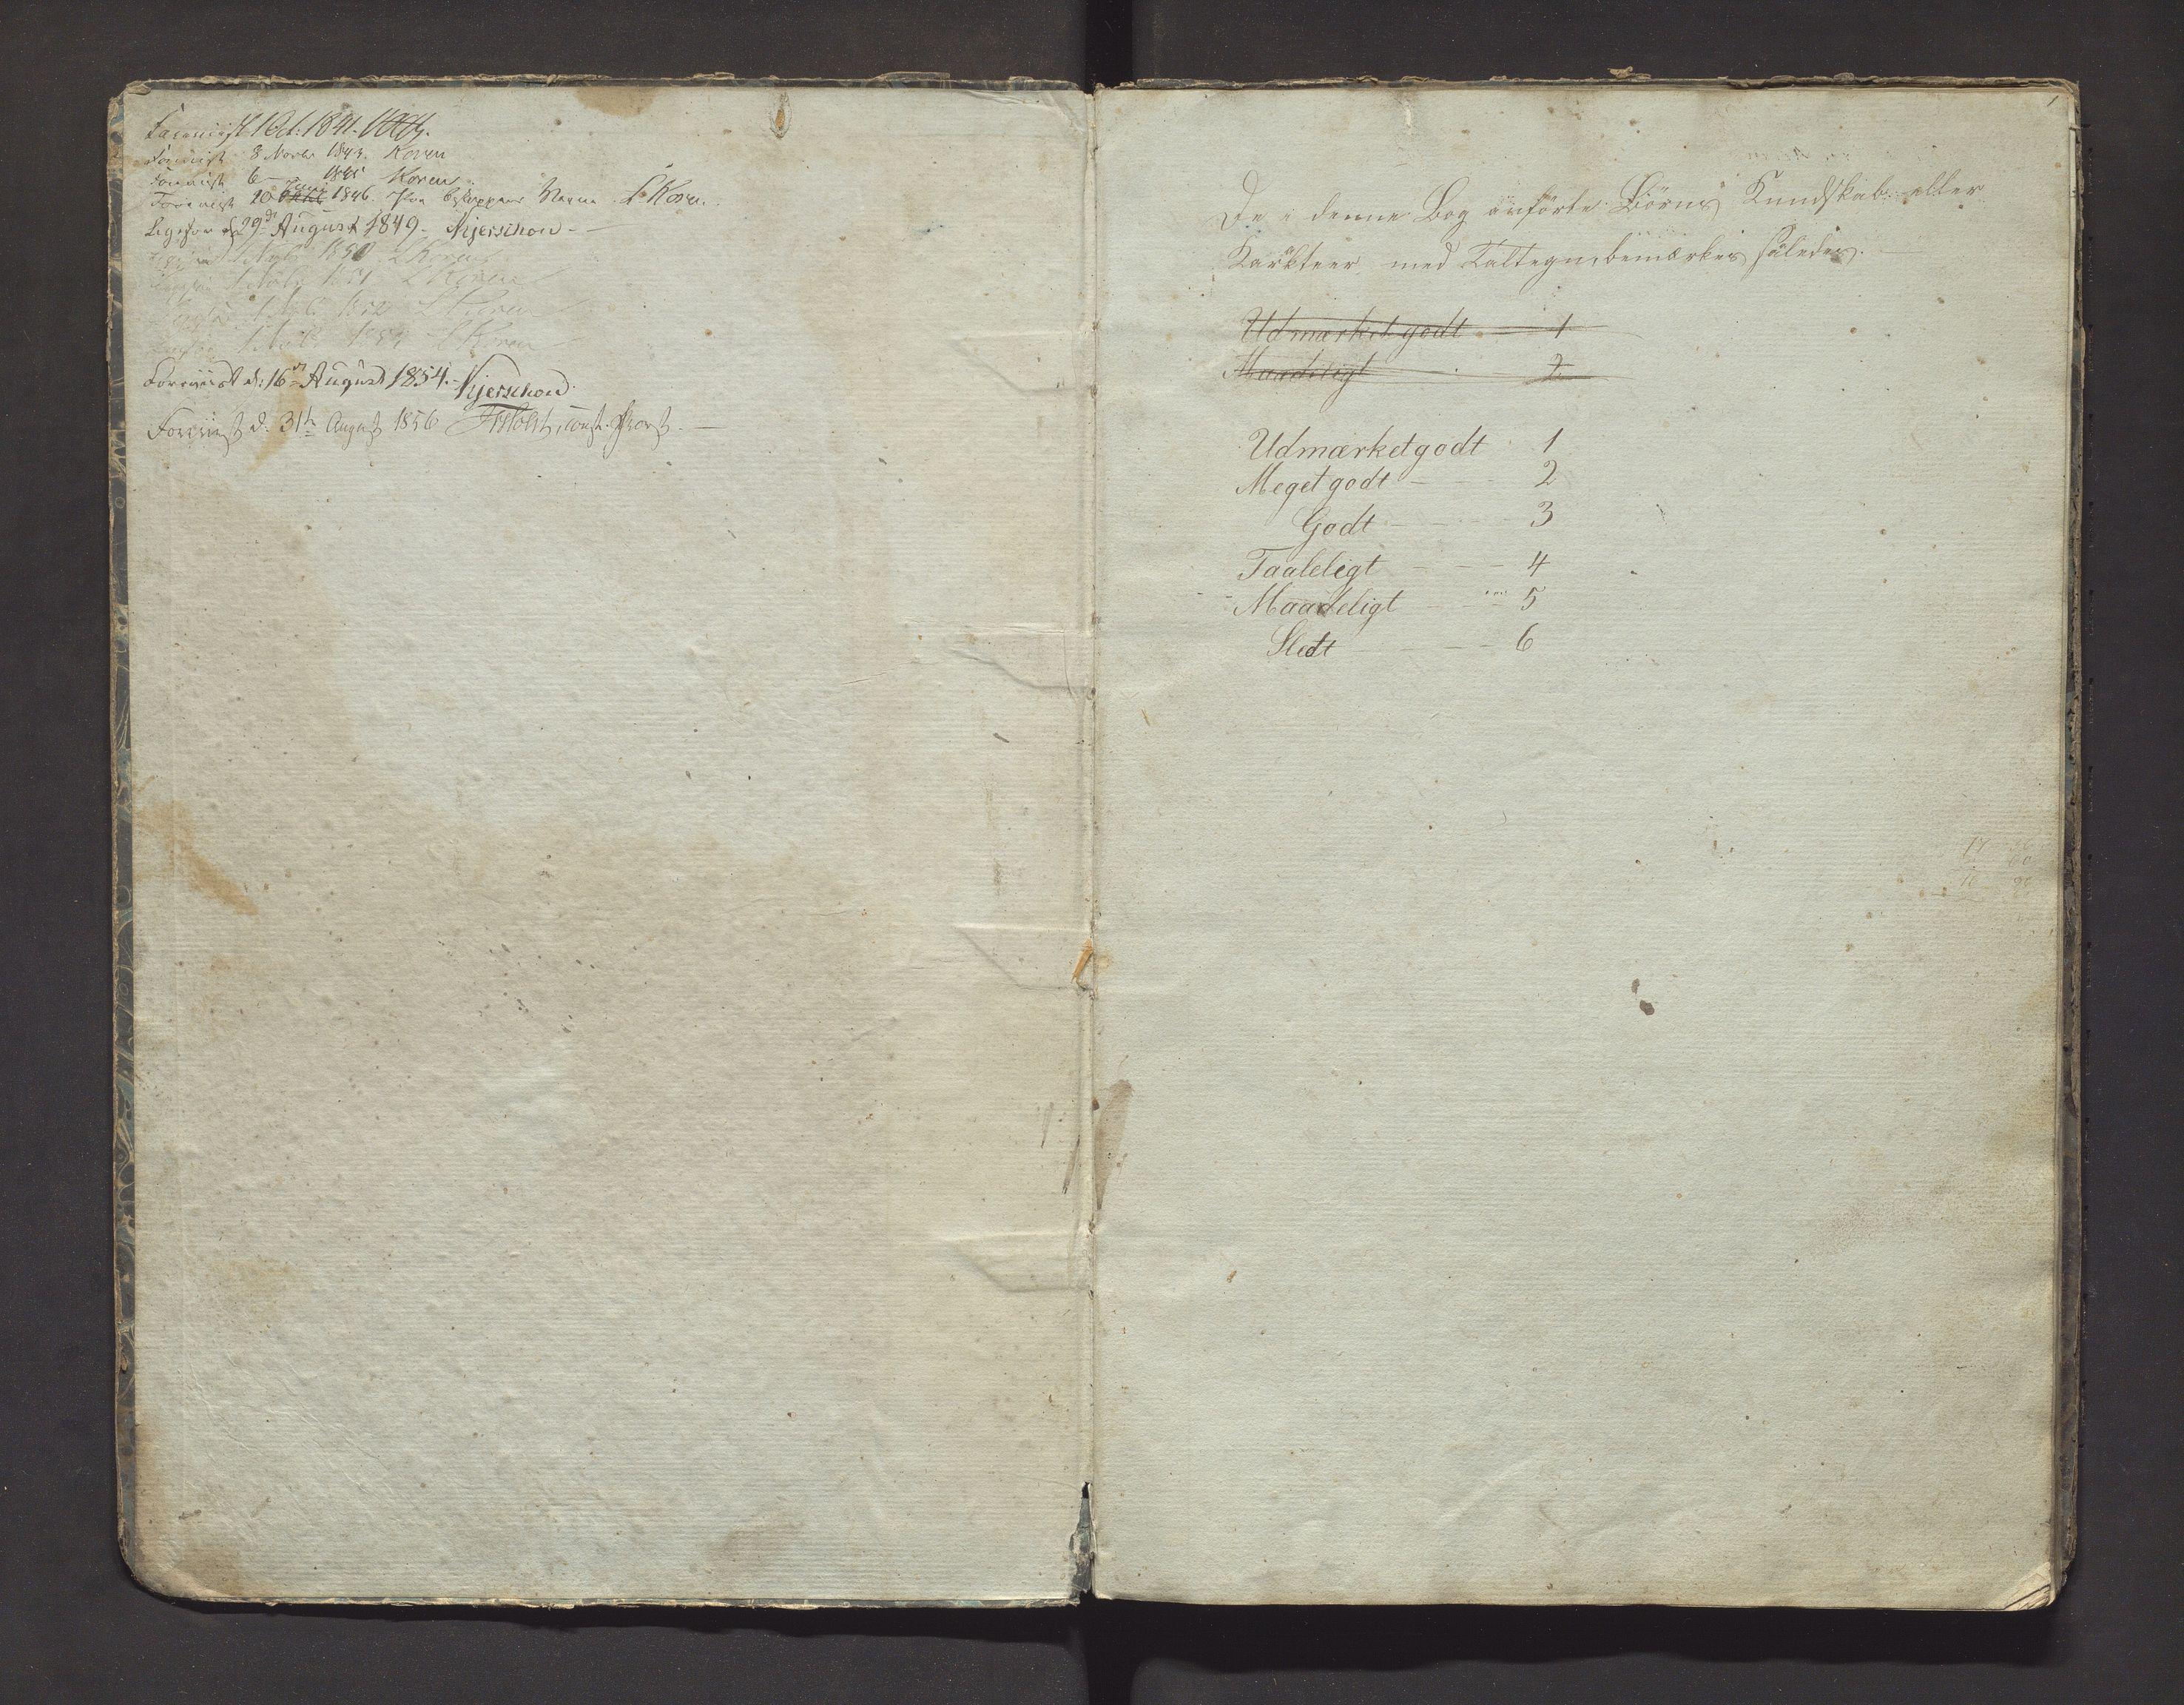 IKAH, Fjelberg kommune. Barneskulane, F/Fa/L0001: Skuleprotokoll for søndre distrikt i Fjelberg sokn, 1841-1855